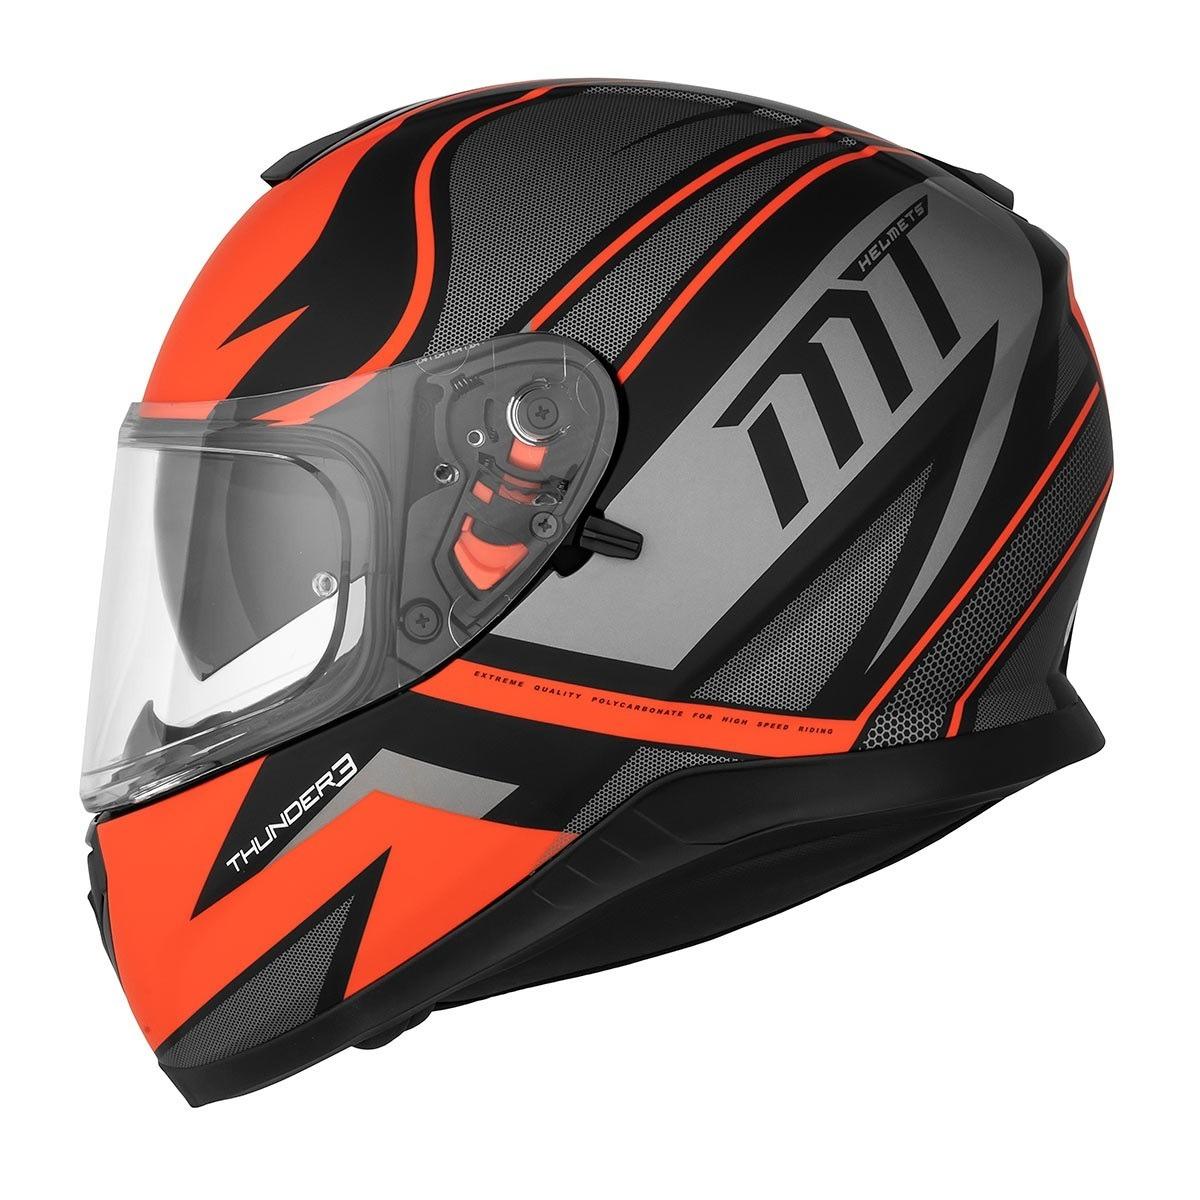 b78d8c31 Casco Mt Helmets Thunder 3 Sv Cap A Doble Visor Cuotas - $ 6.064,34 ...